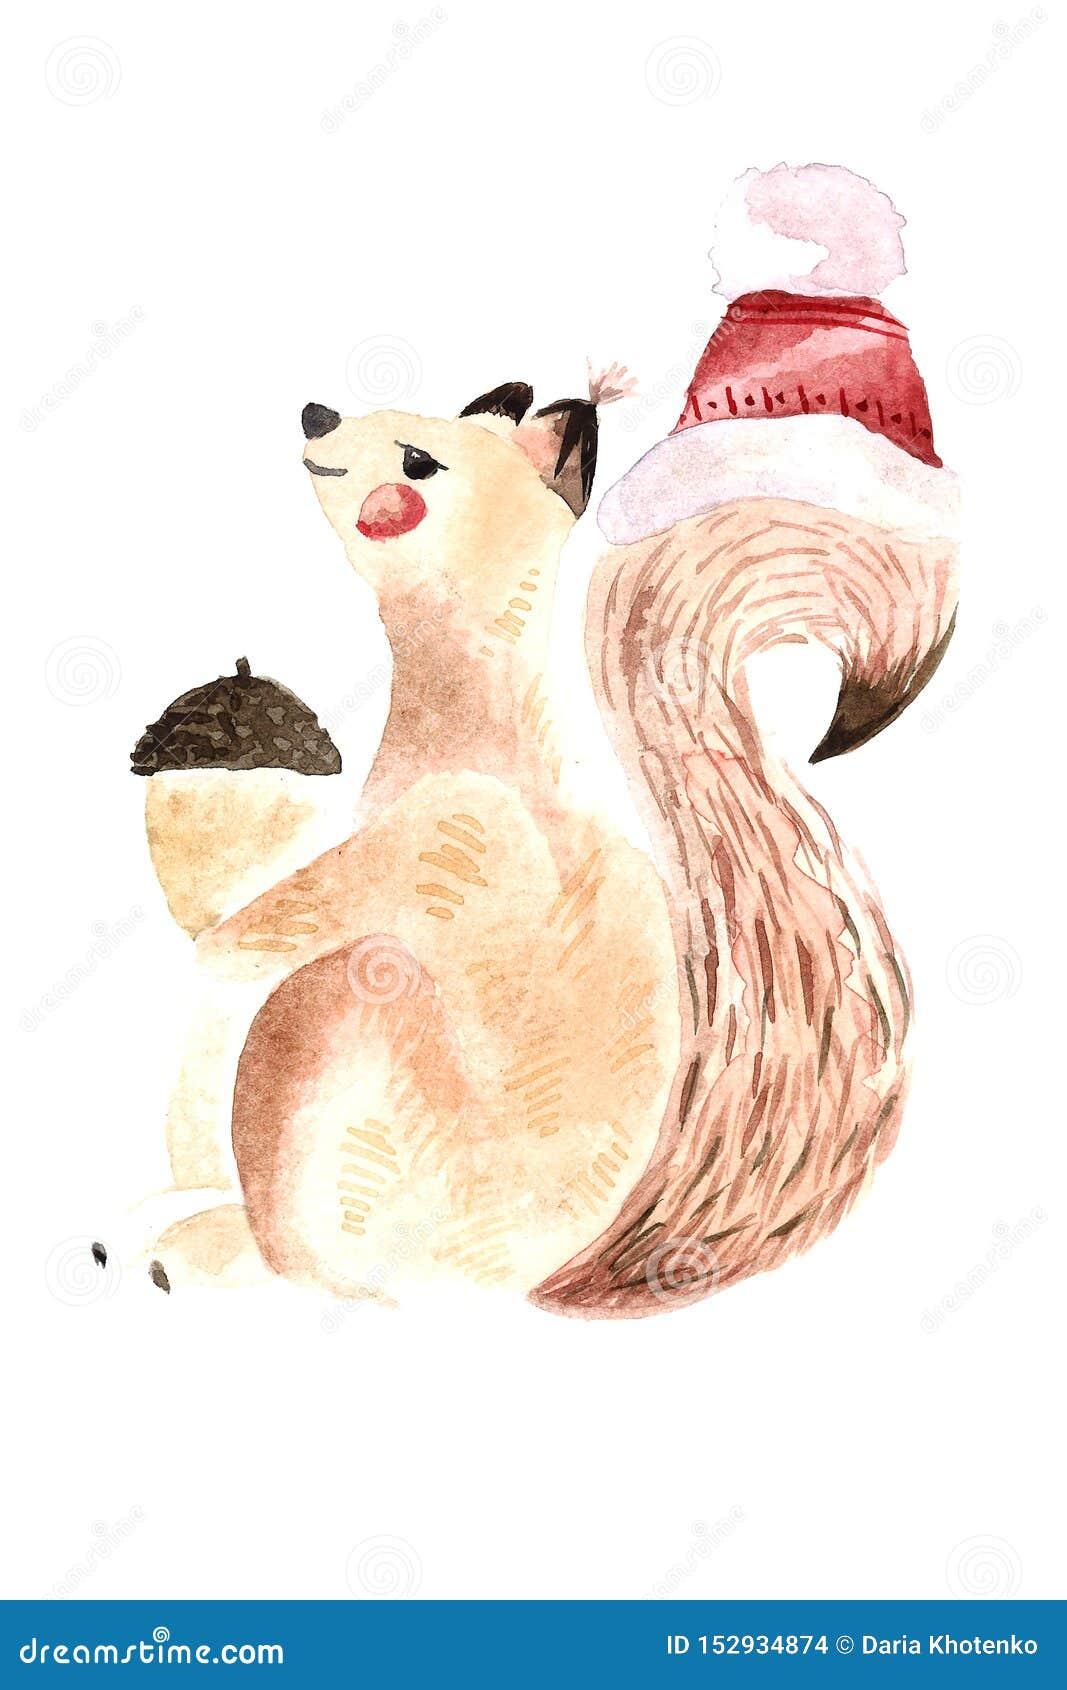 Watercolor squirrel with nut